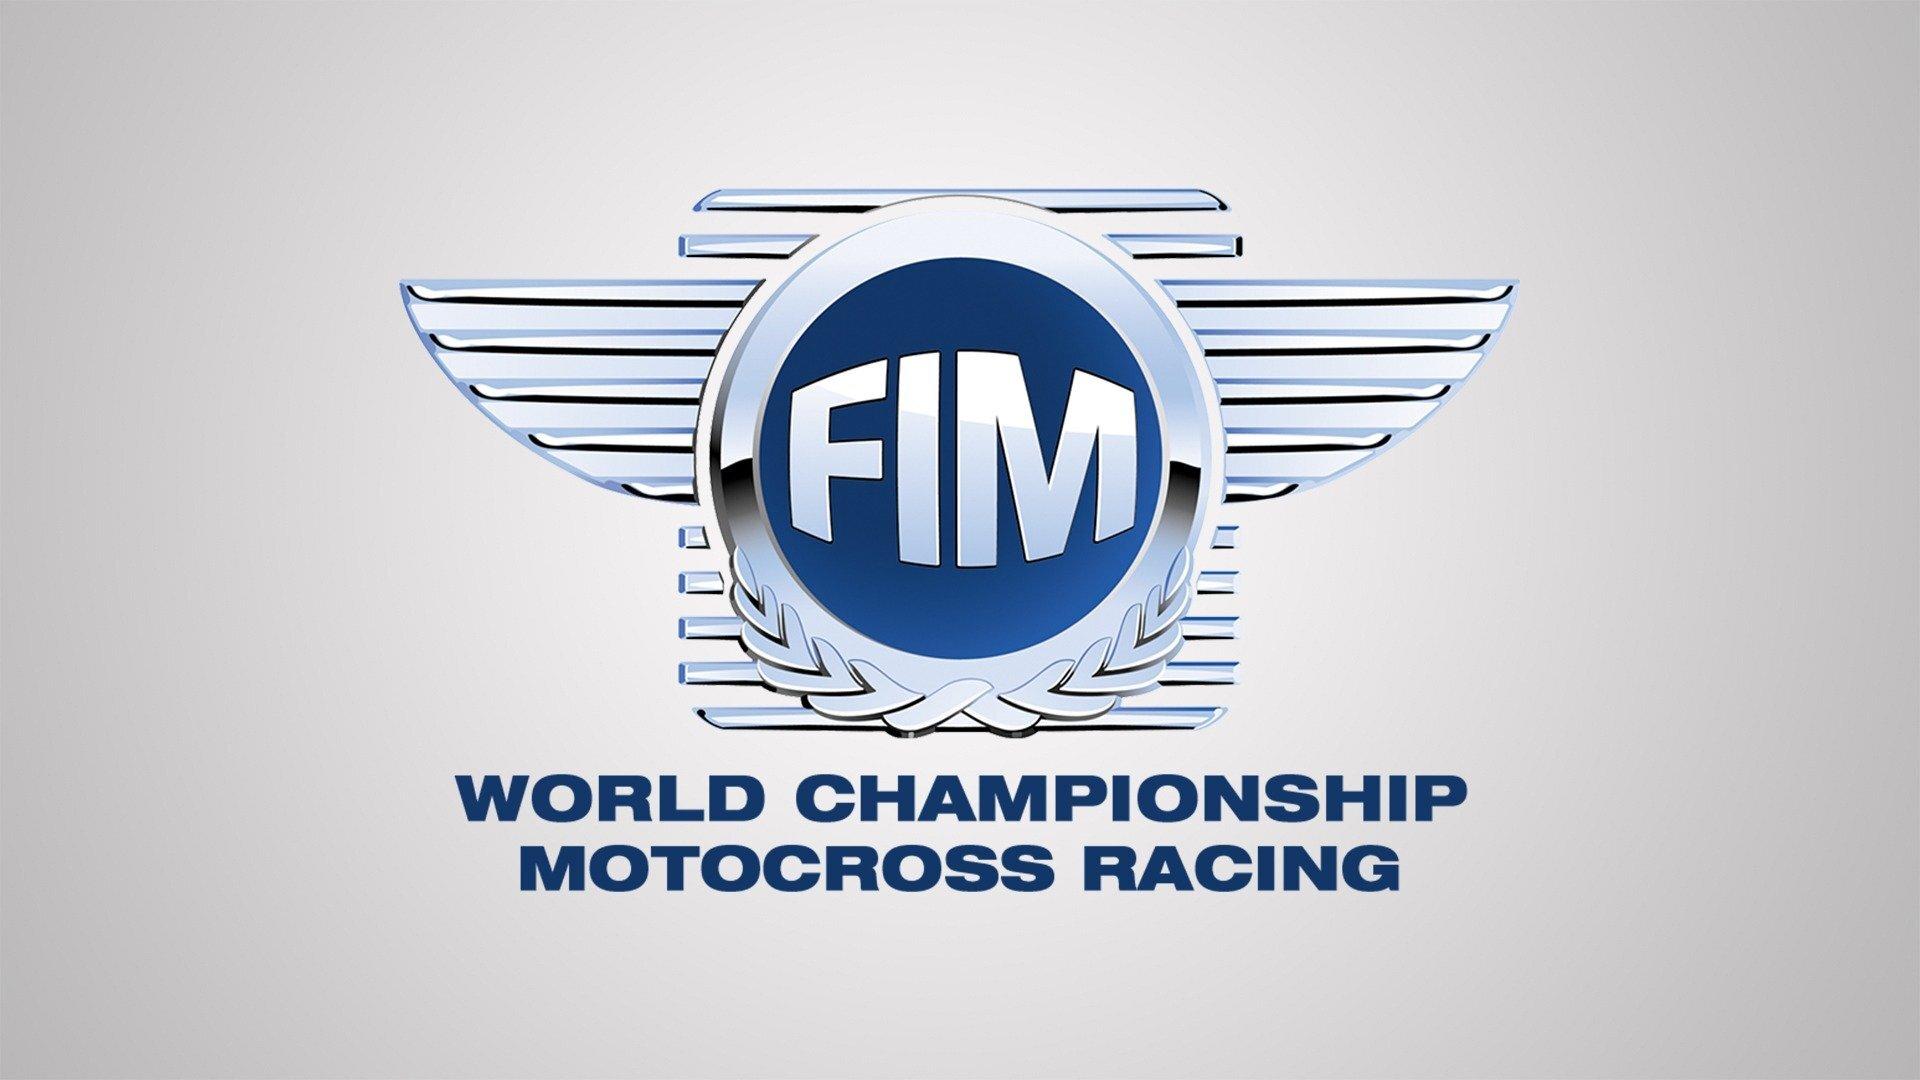 FIM World Championship Motocross Racing